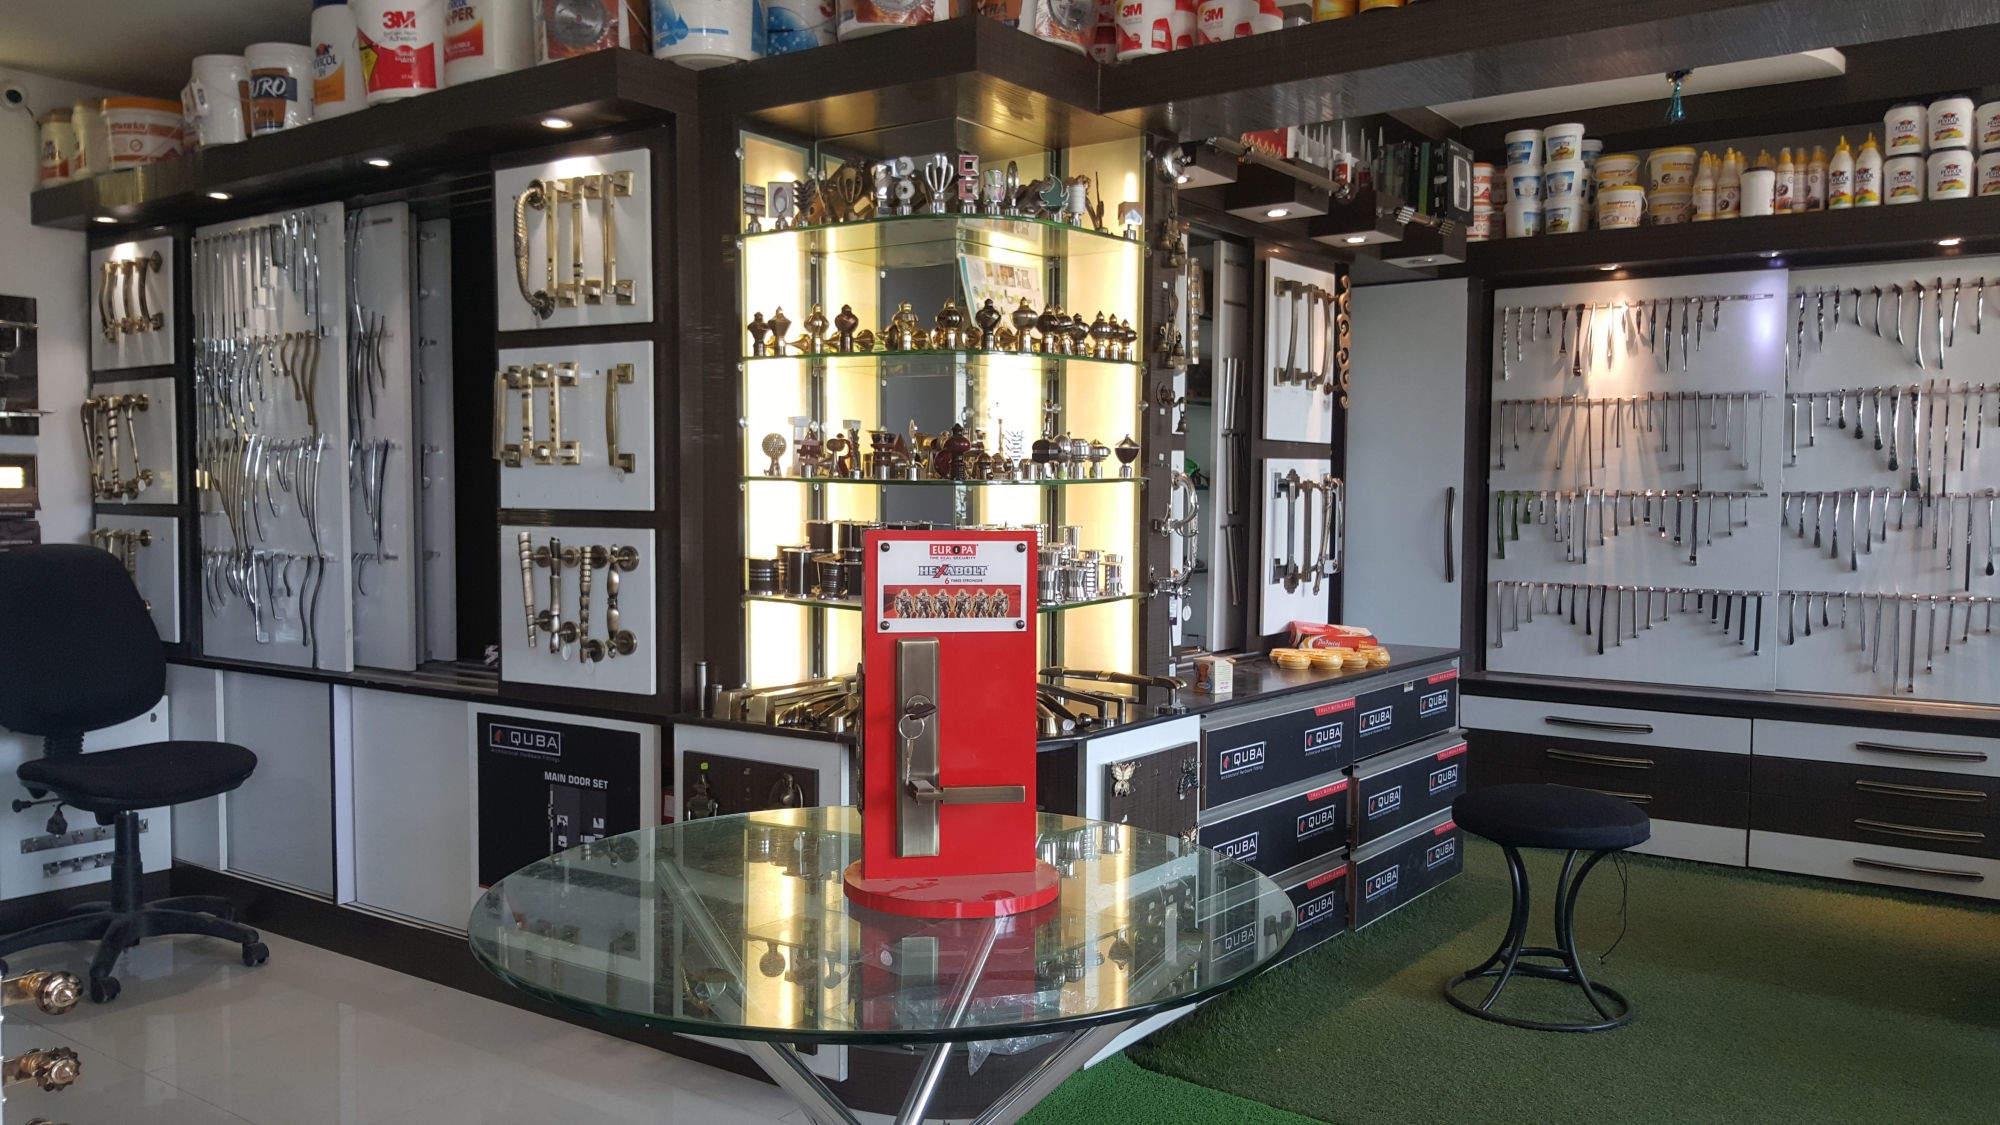 Top 100 Hardware Shops in Doddabidarakallu - Best Hardware Stores